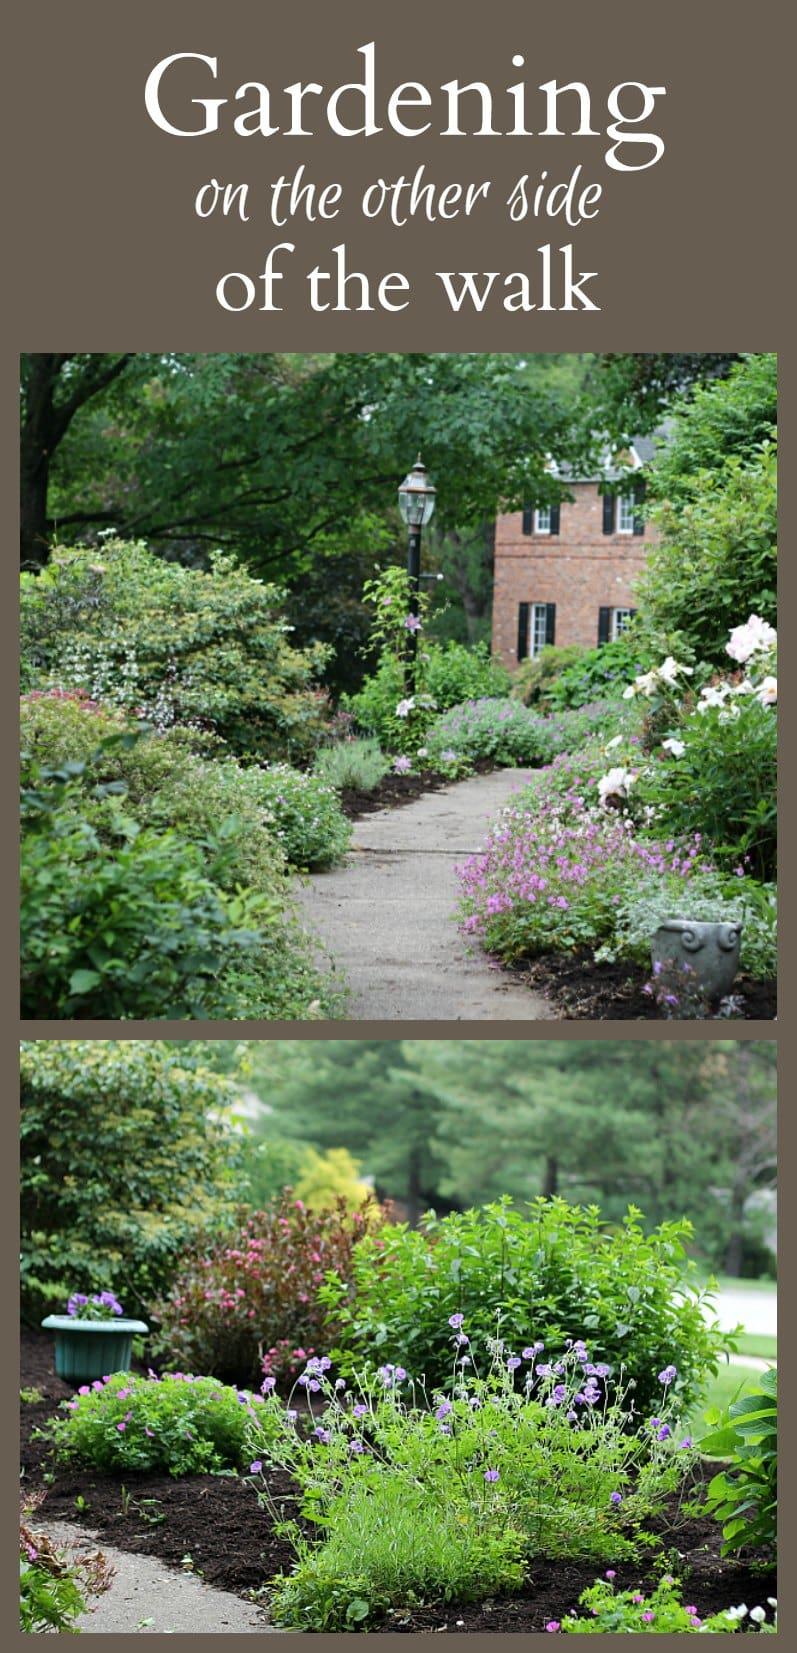 Gardening on the other side - gardenmatter.com